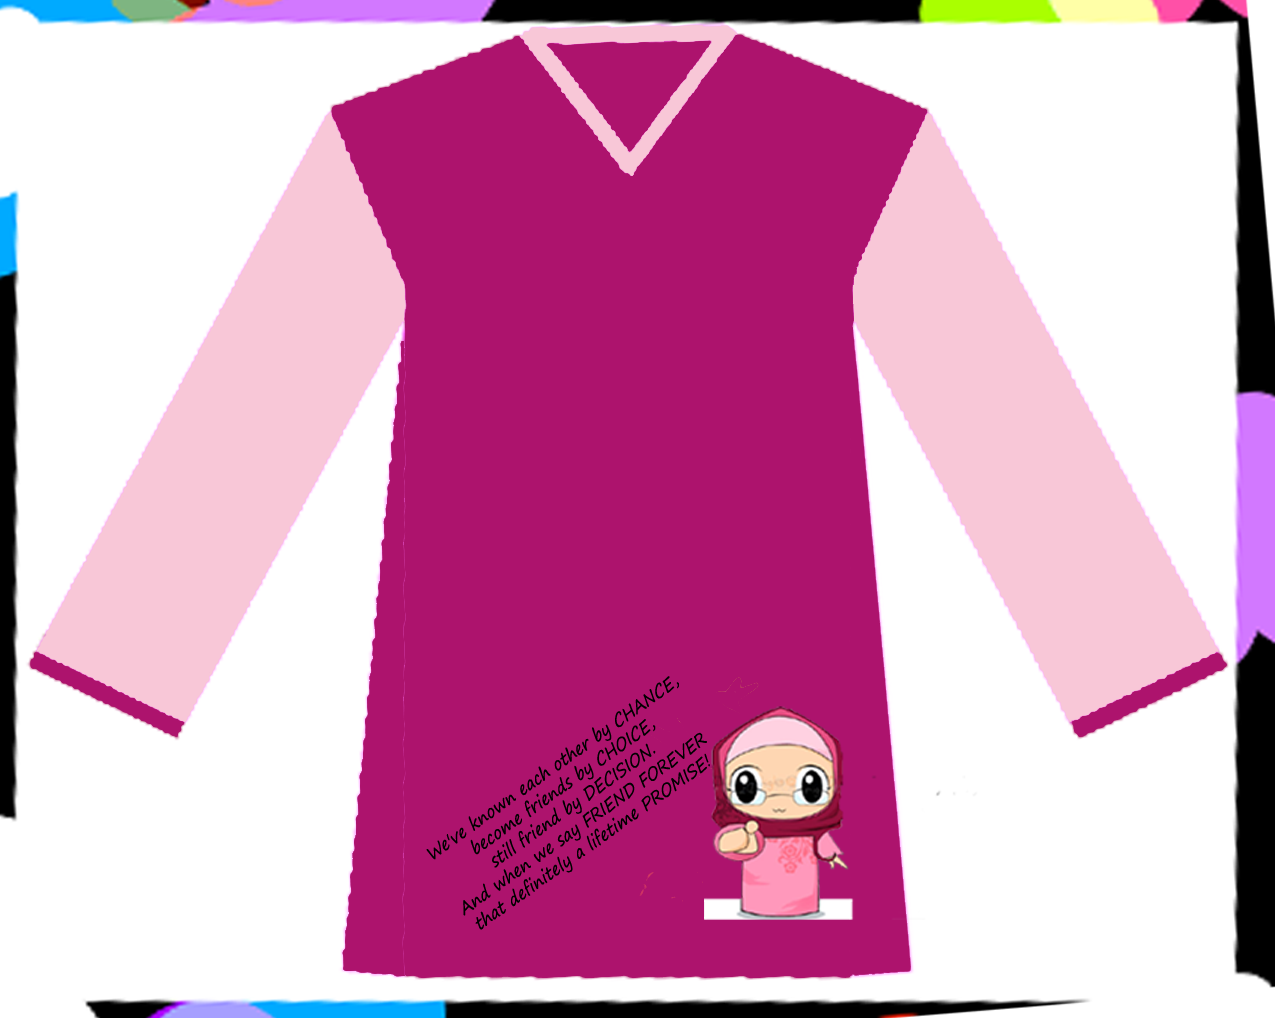 Design baju t shirt kelas - Baju Kelas Al Razi Front